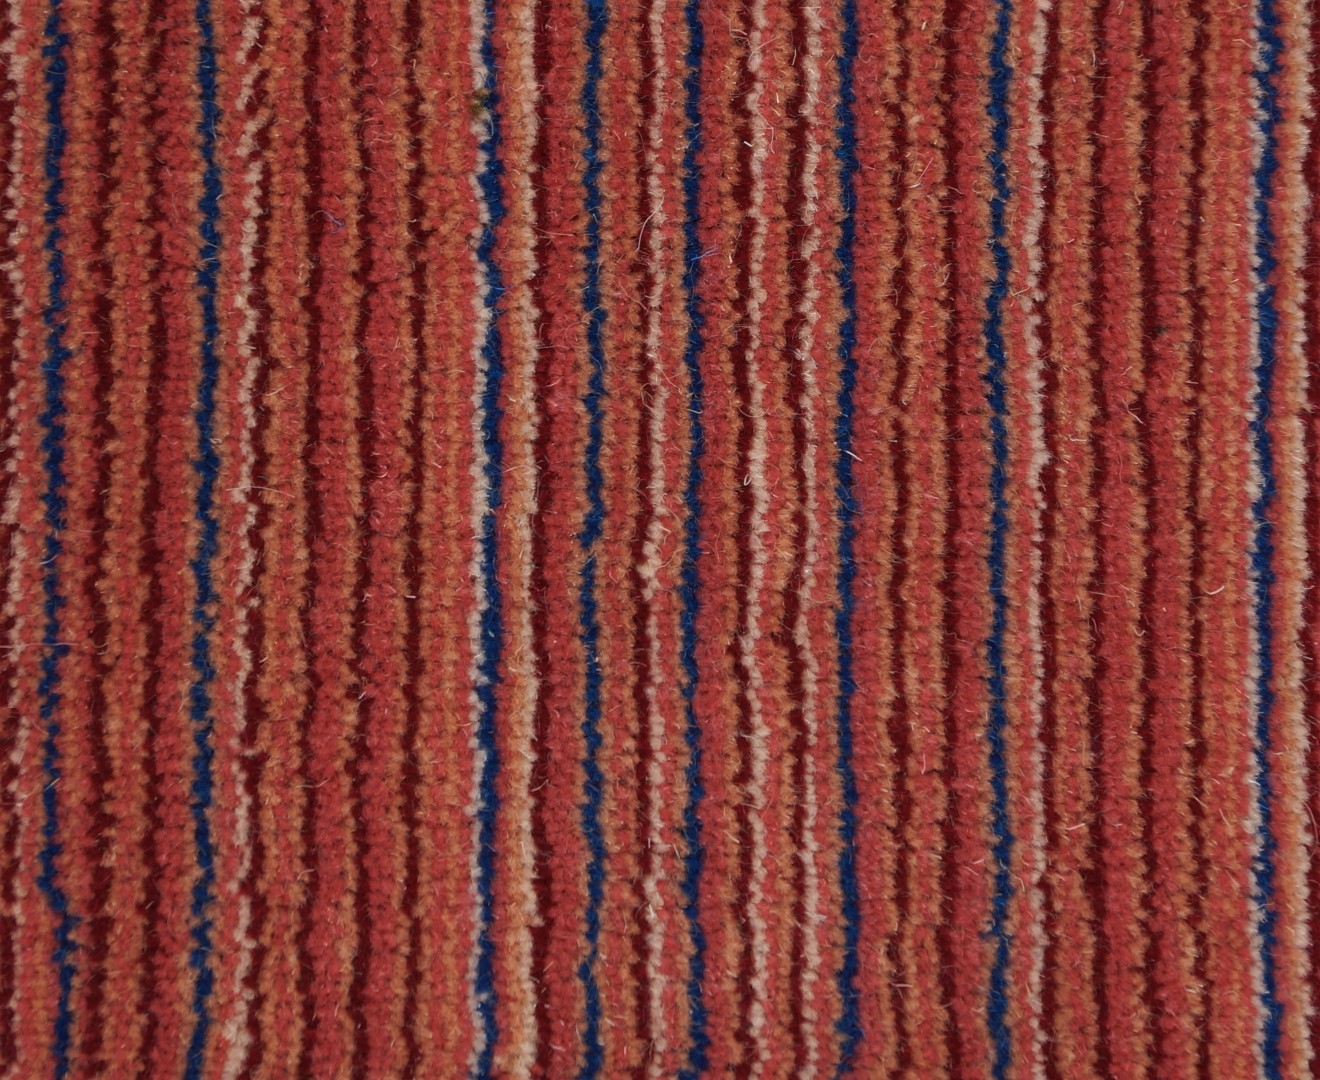 Moquette tiss e 100 laine unie structur e ray e milres rouge collection textile for Moquette rayee